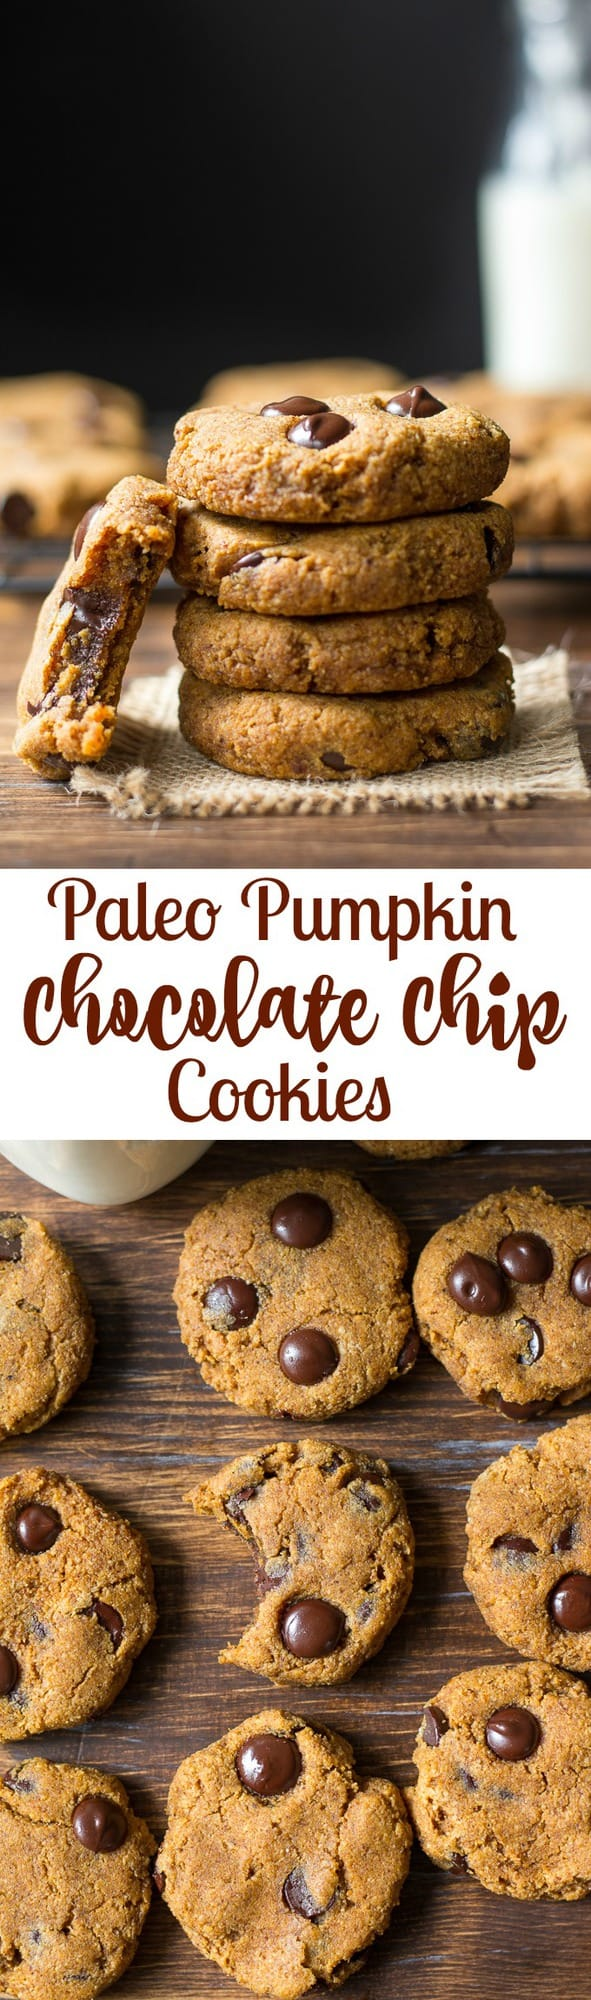 Paleo Pumpkin Chocolate Chip Cookies | The Paleo Running Momma